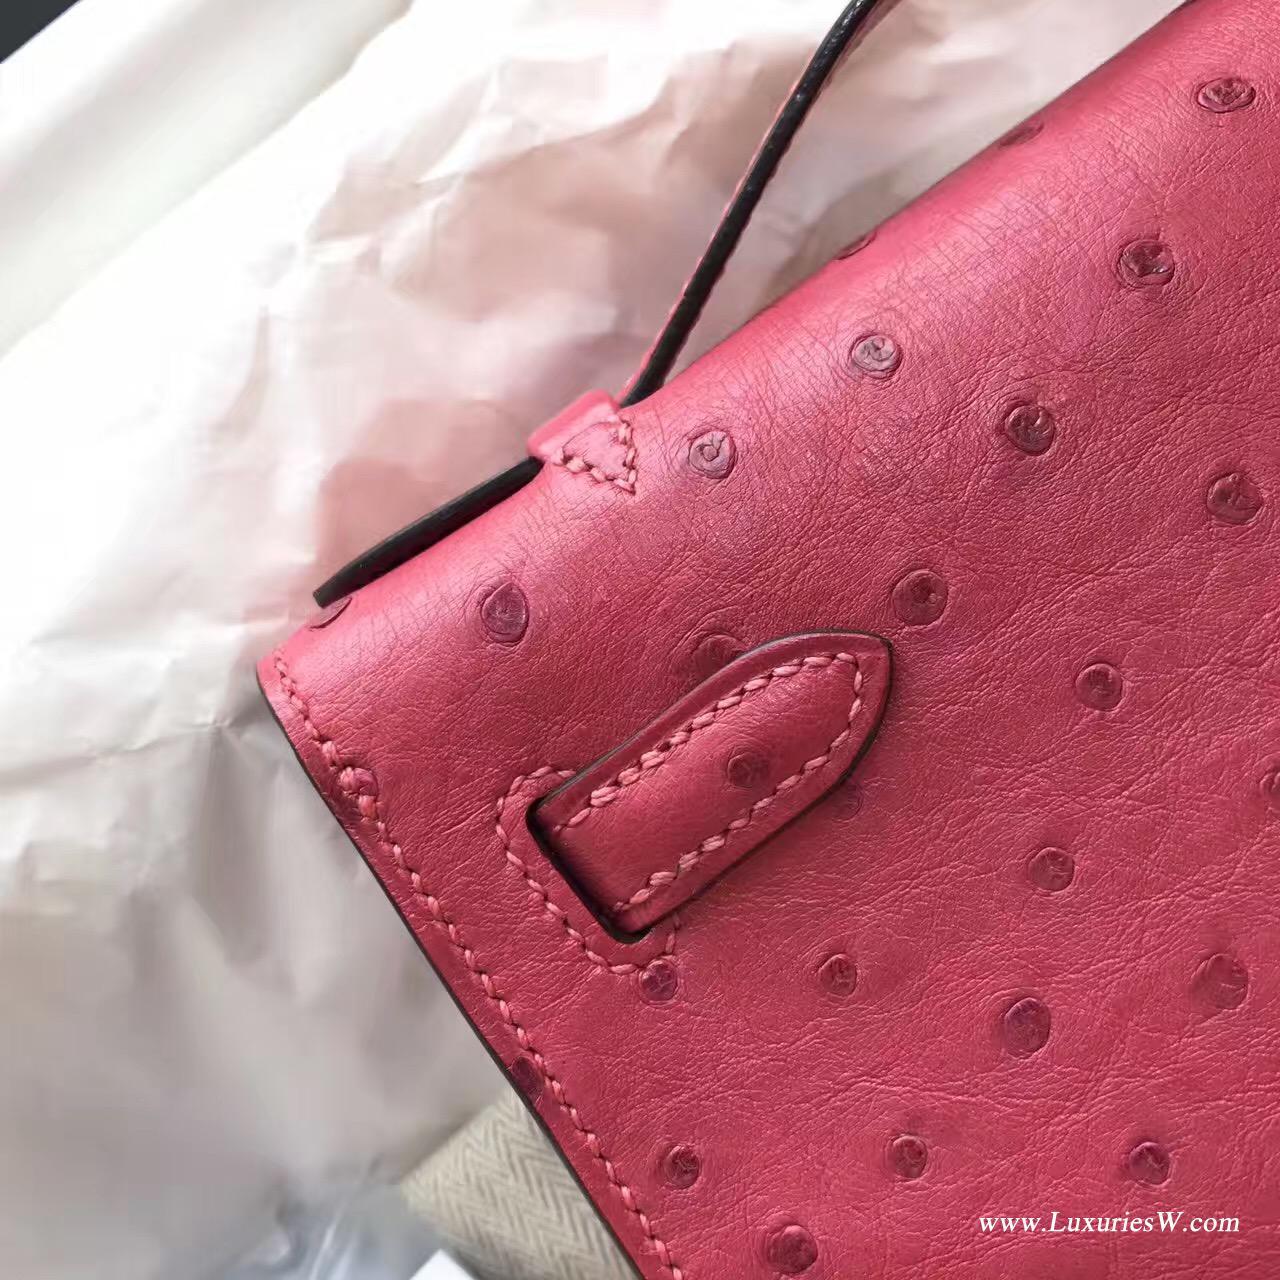 Mini Kelly鸵鸟新颜色8W Rose Azalee 新唇膏粉色 适合夏天用金色金属